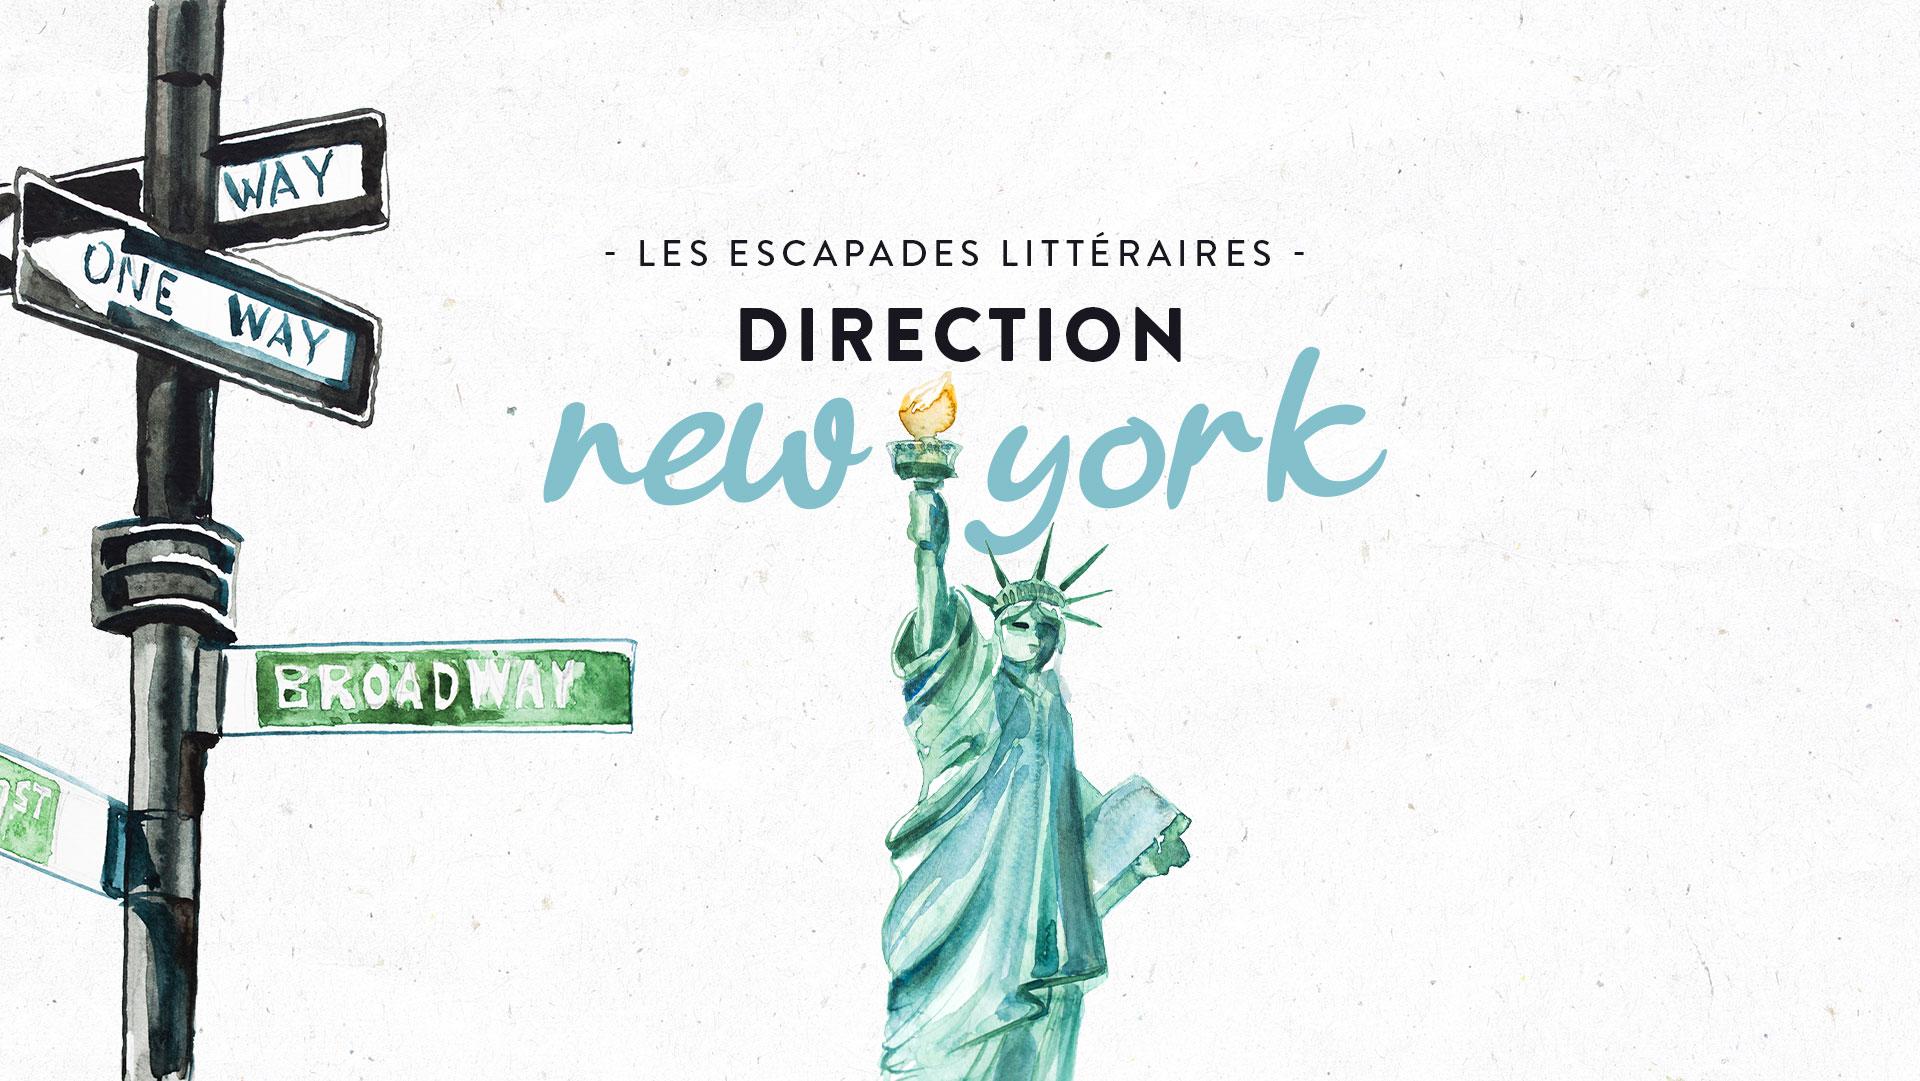 Livres-a-new-york